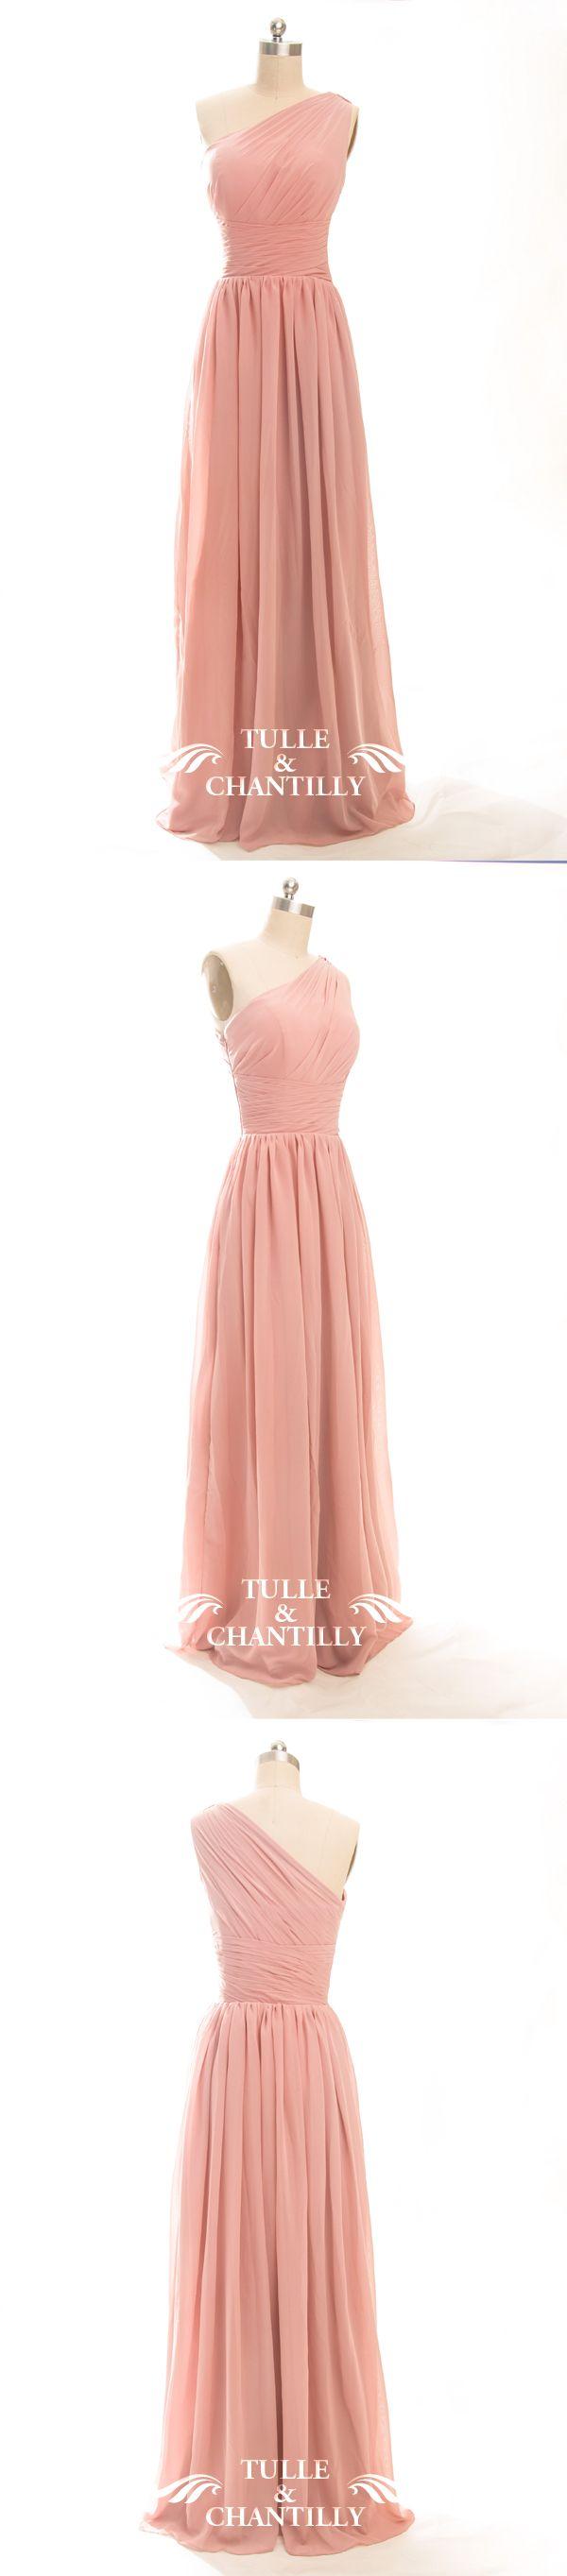 Long One Shoulder Bridesmaid Dress with Sash TBQP246   Pinterest ...